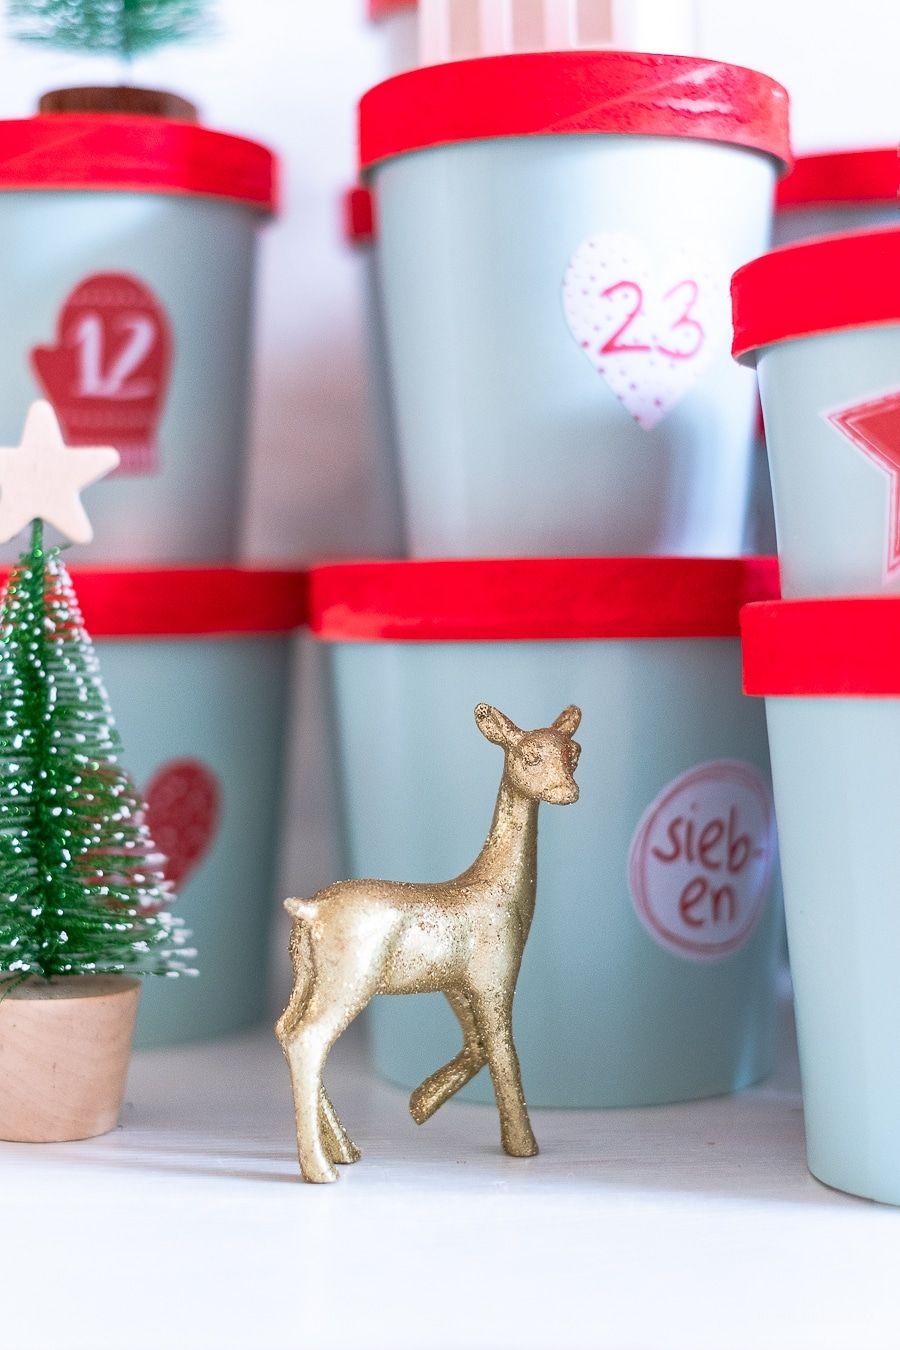 Adventskalender aus Pappbechern, DIY, Upcycling, Advenskalender basteln, Edding Sprühfarbe, Weihnachten, Weihnachtsdeko, Weihnachtsgeschenke, Geschenkideen für Kinder